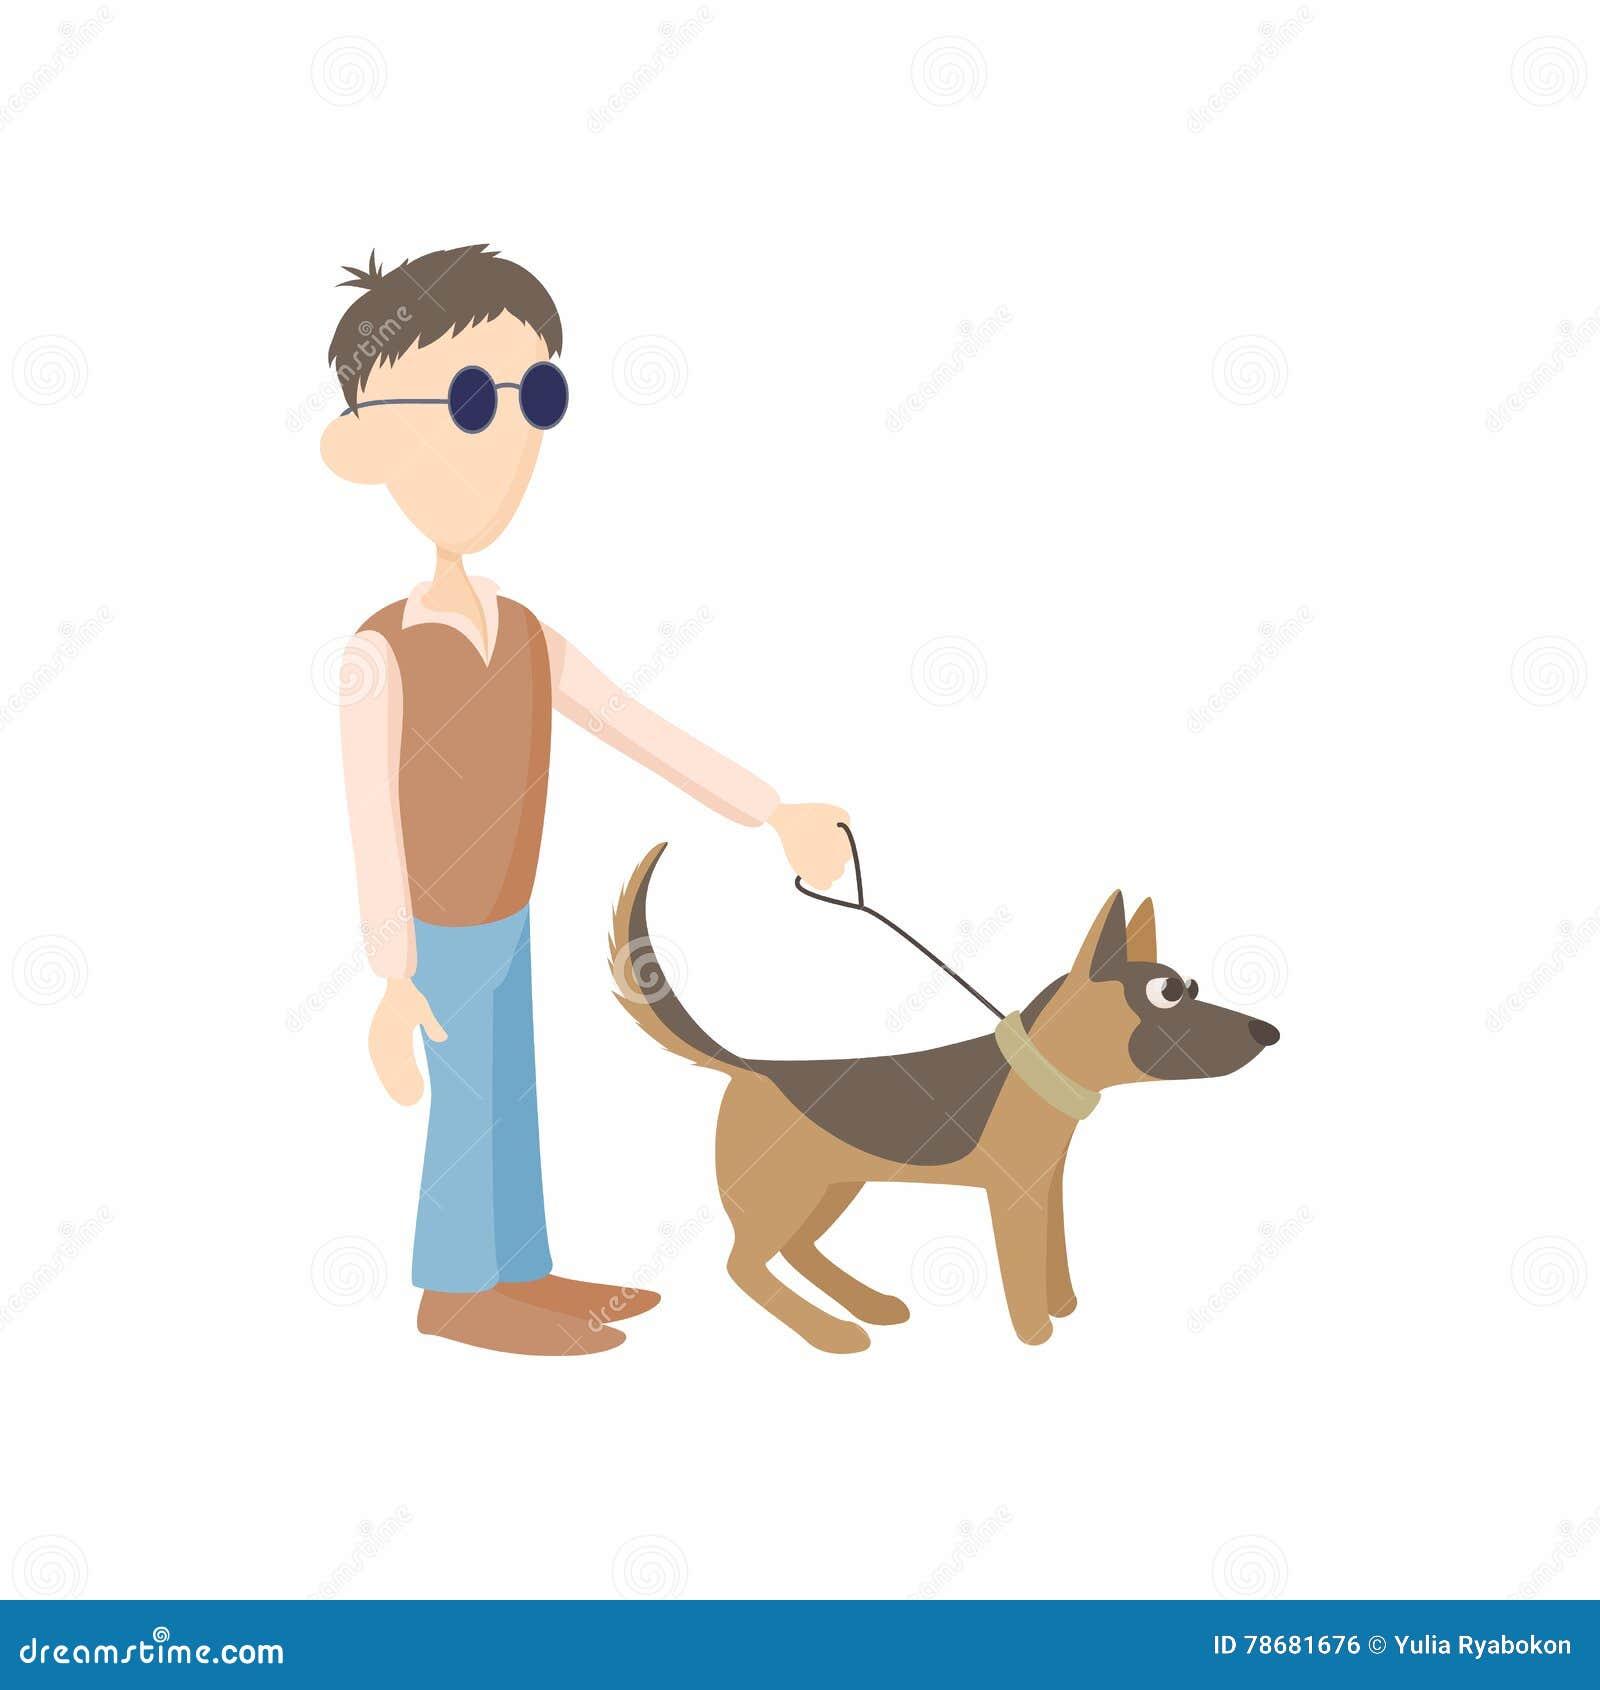 Classroom Design Tips For Visually Impaired ~ Blind seeing eye cane eresting stuff smart walking